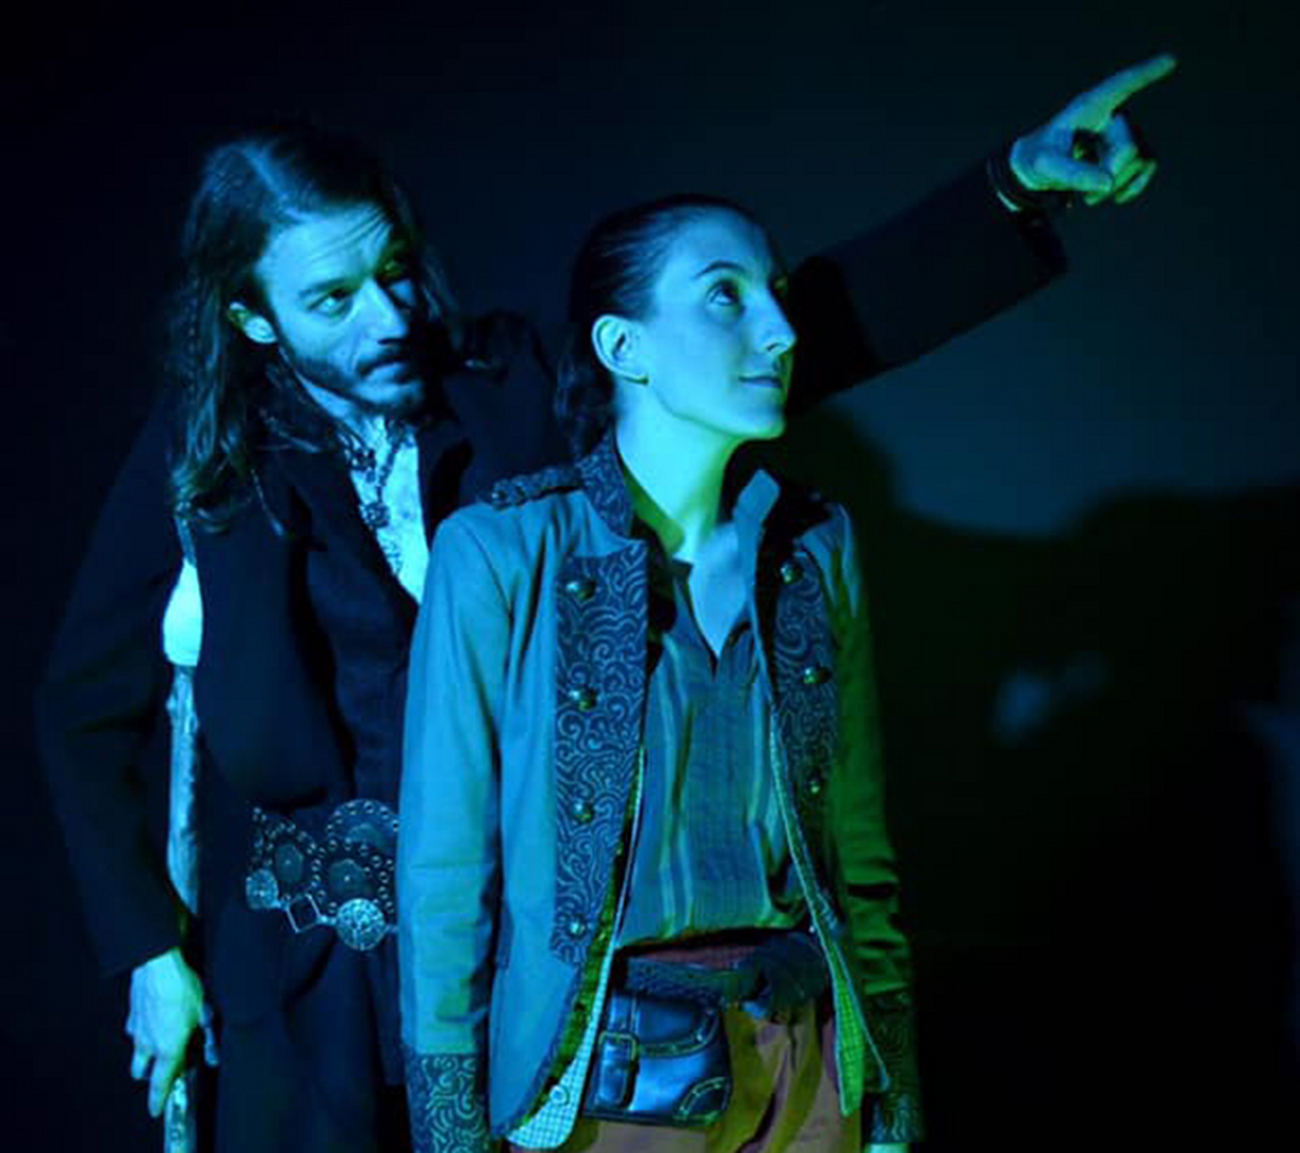 BWW Review: TREASURE ISLAND Sets Sail at Eastline Theatre